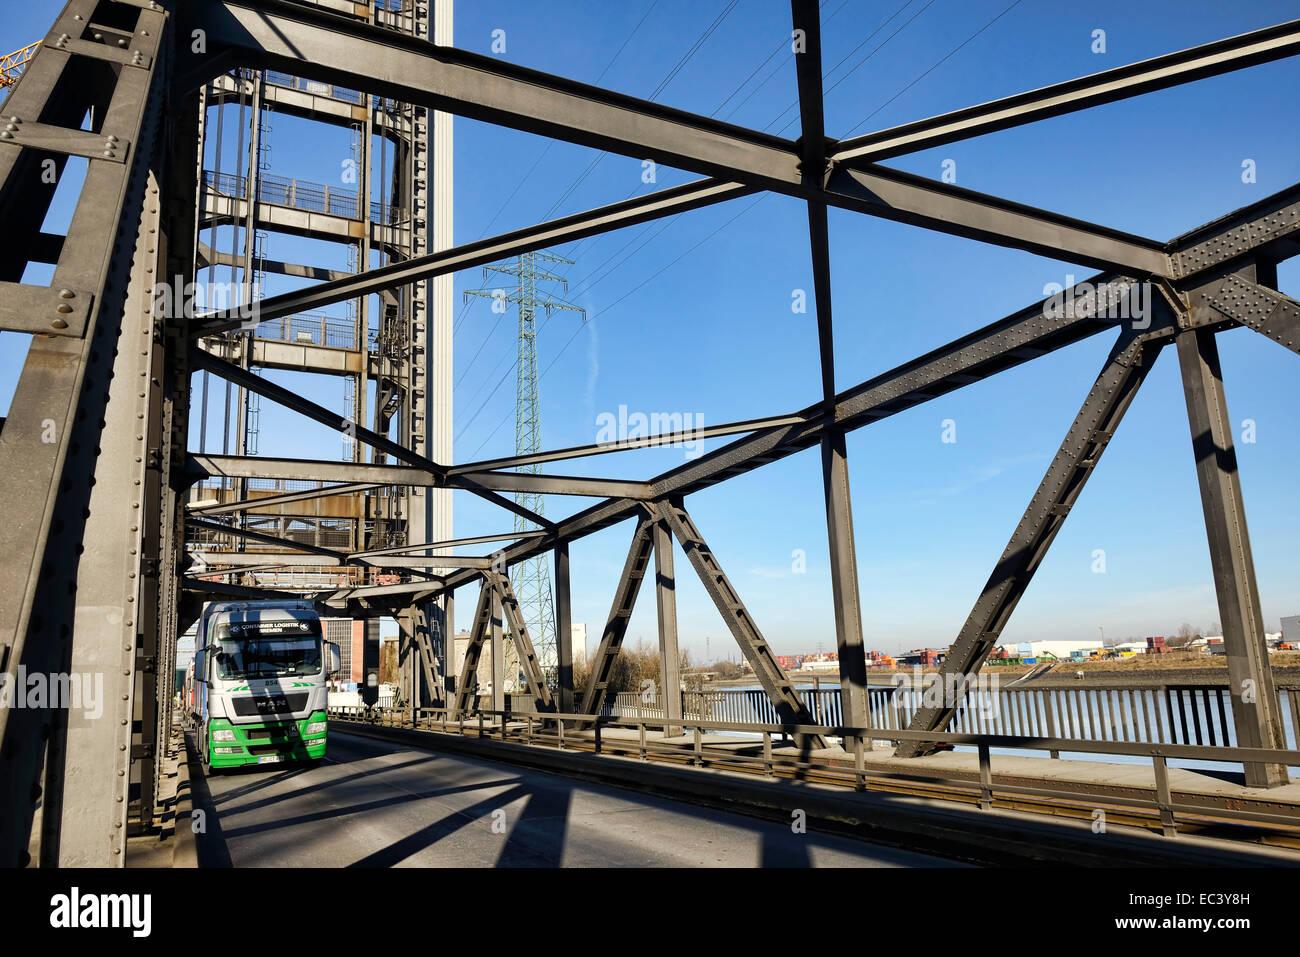 Rethe lift bridge in Hamburg, Germany - Stock Image